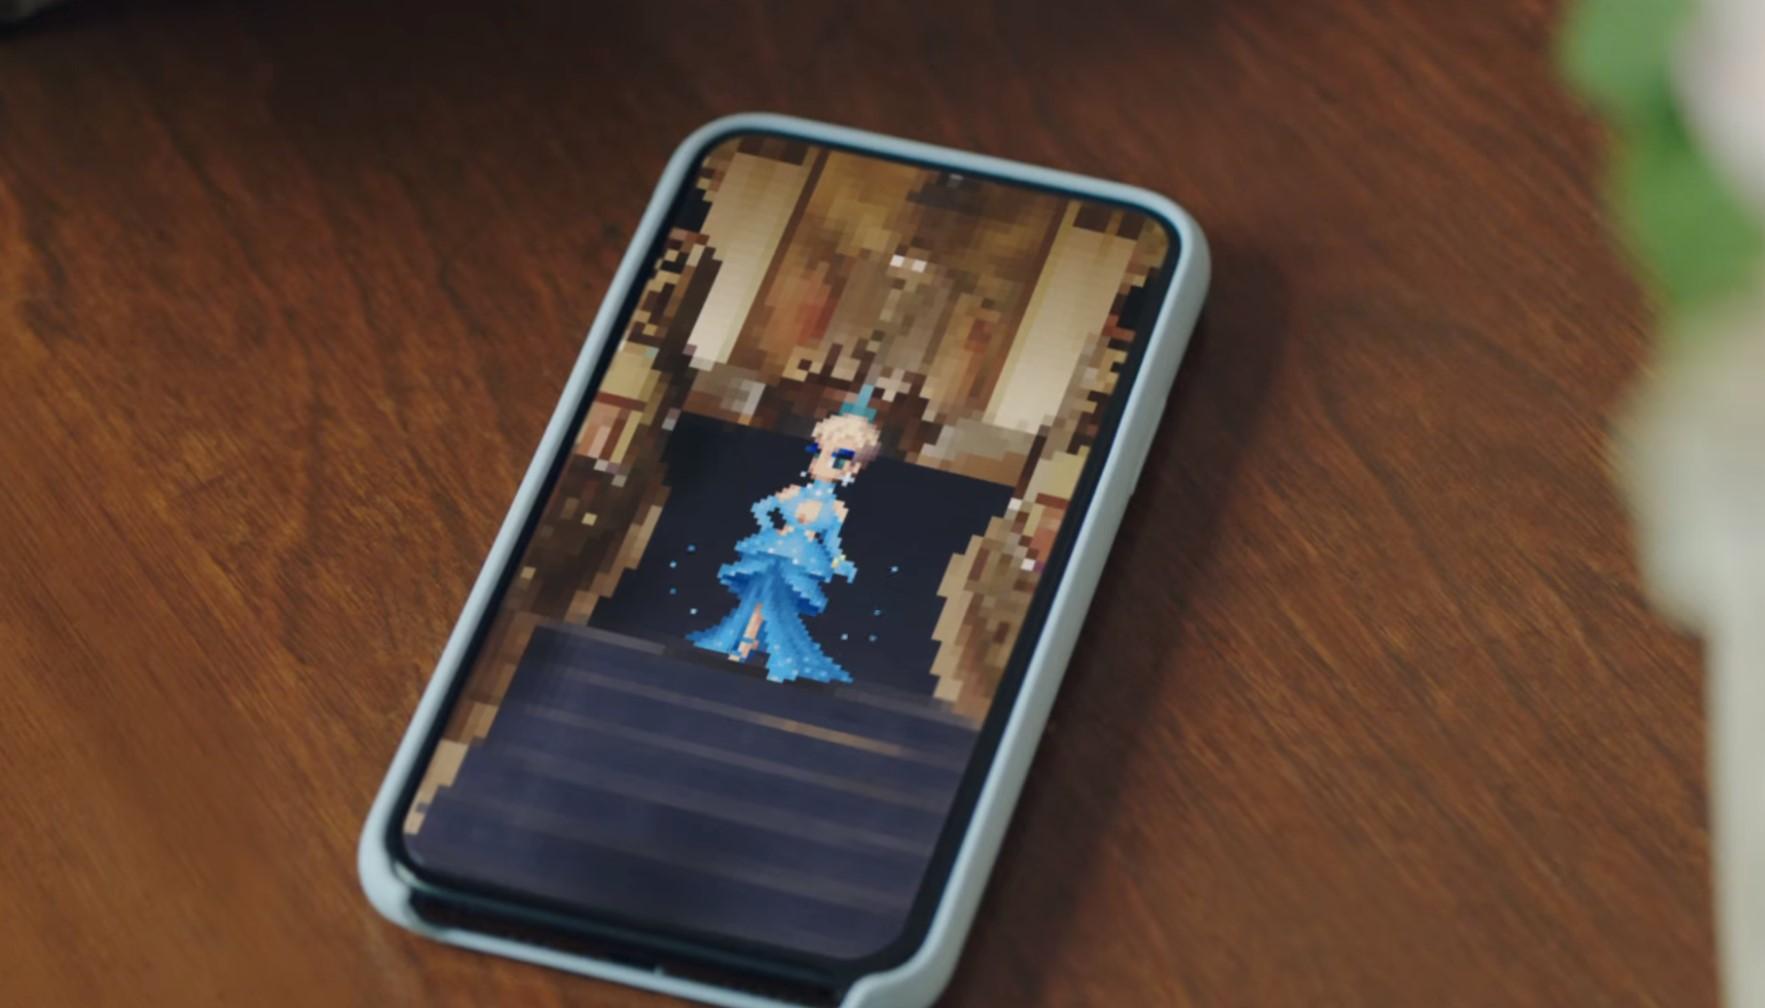 Final Fantasy Brave Exvius, Katy Perry